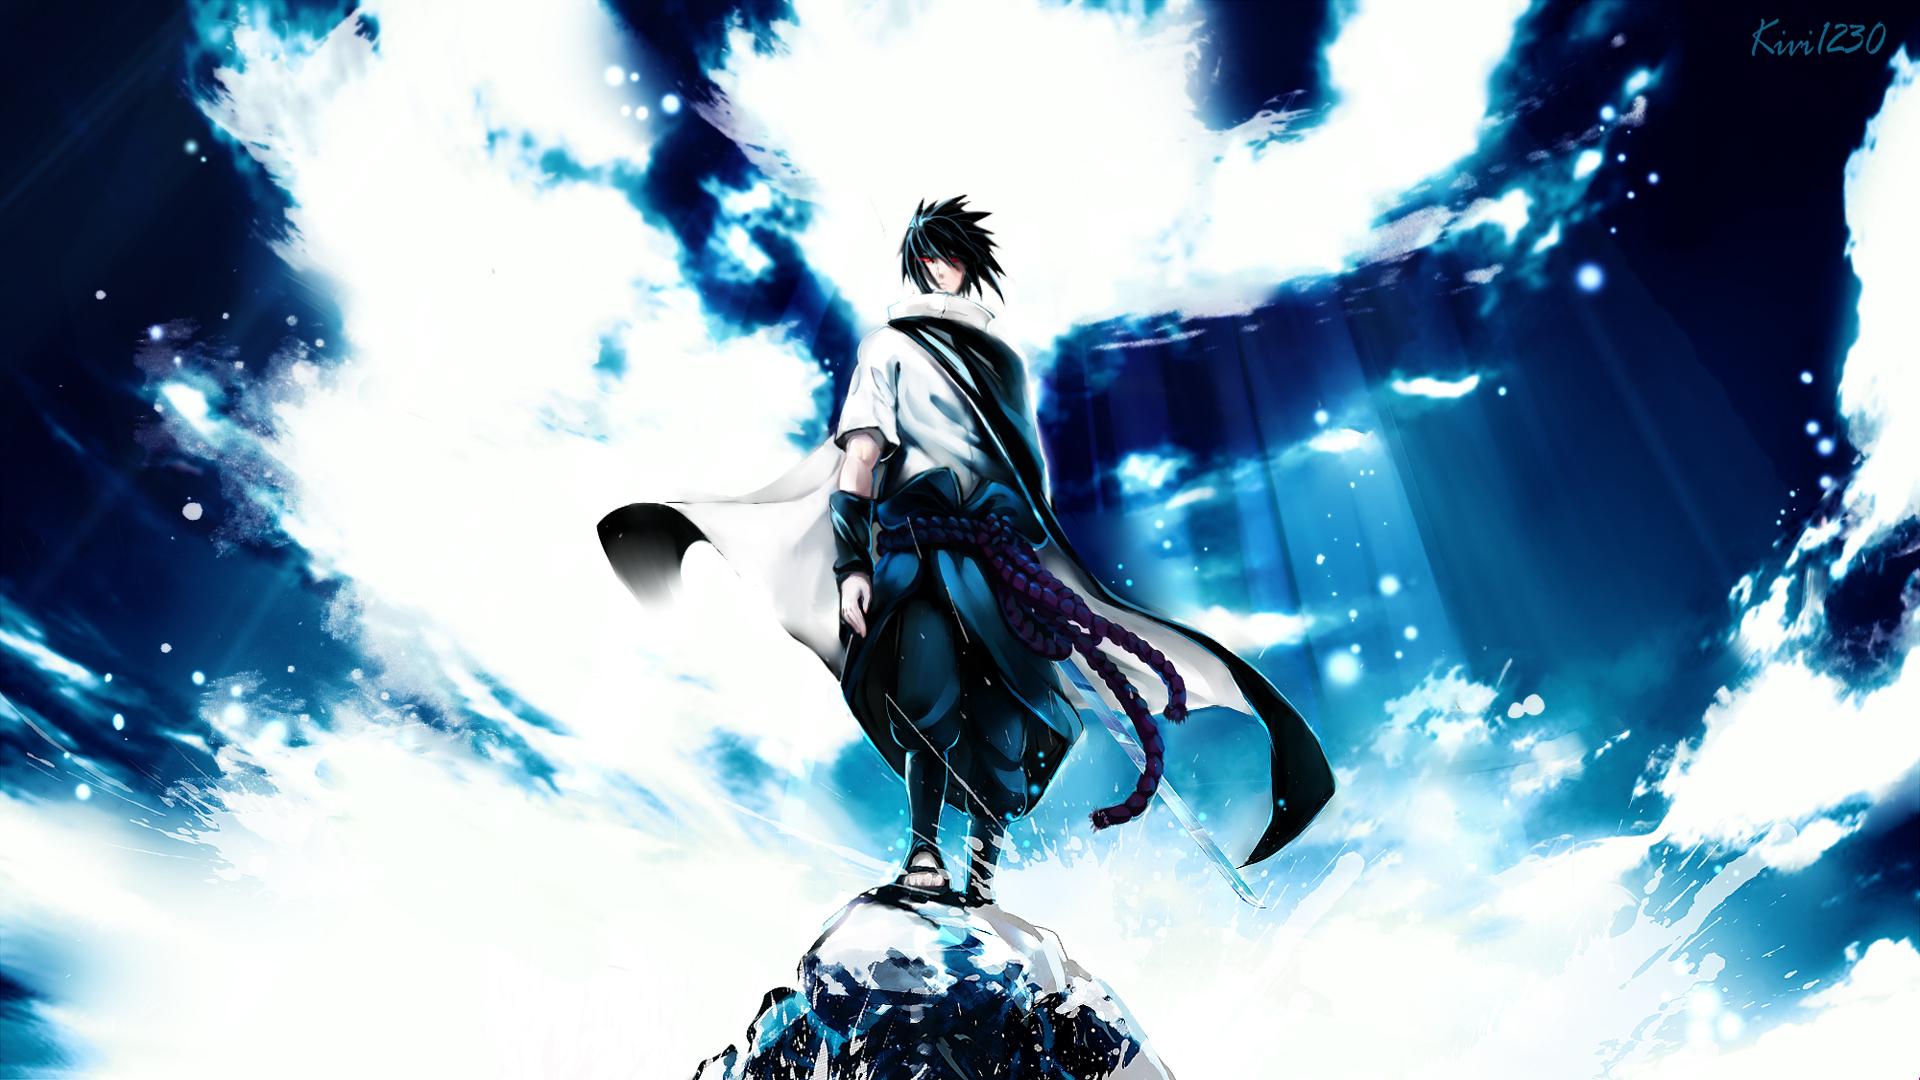 Laptop Anime Wallpapers Desktop Backgrounds Hd Downloads 1920x1080